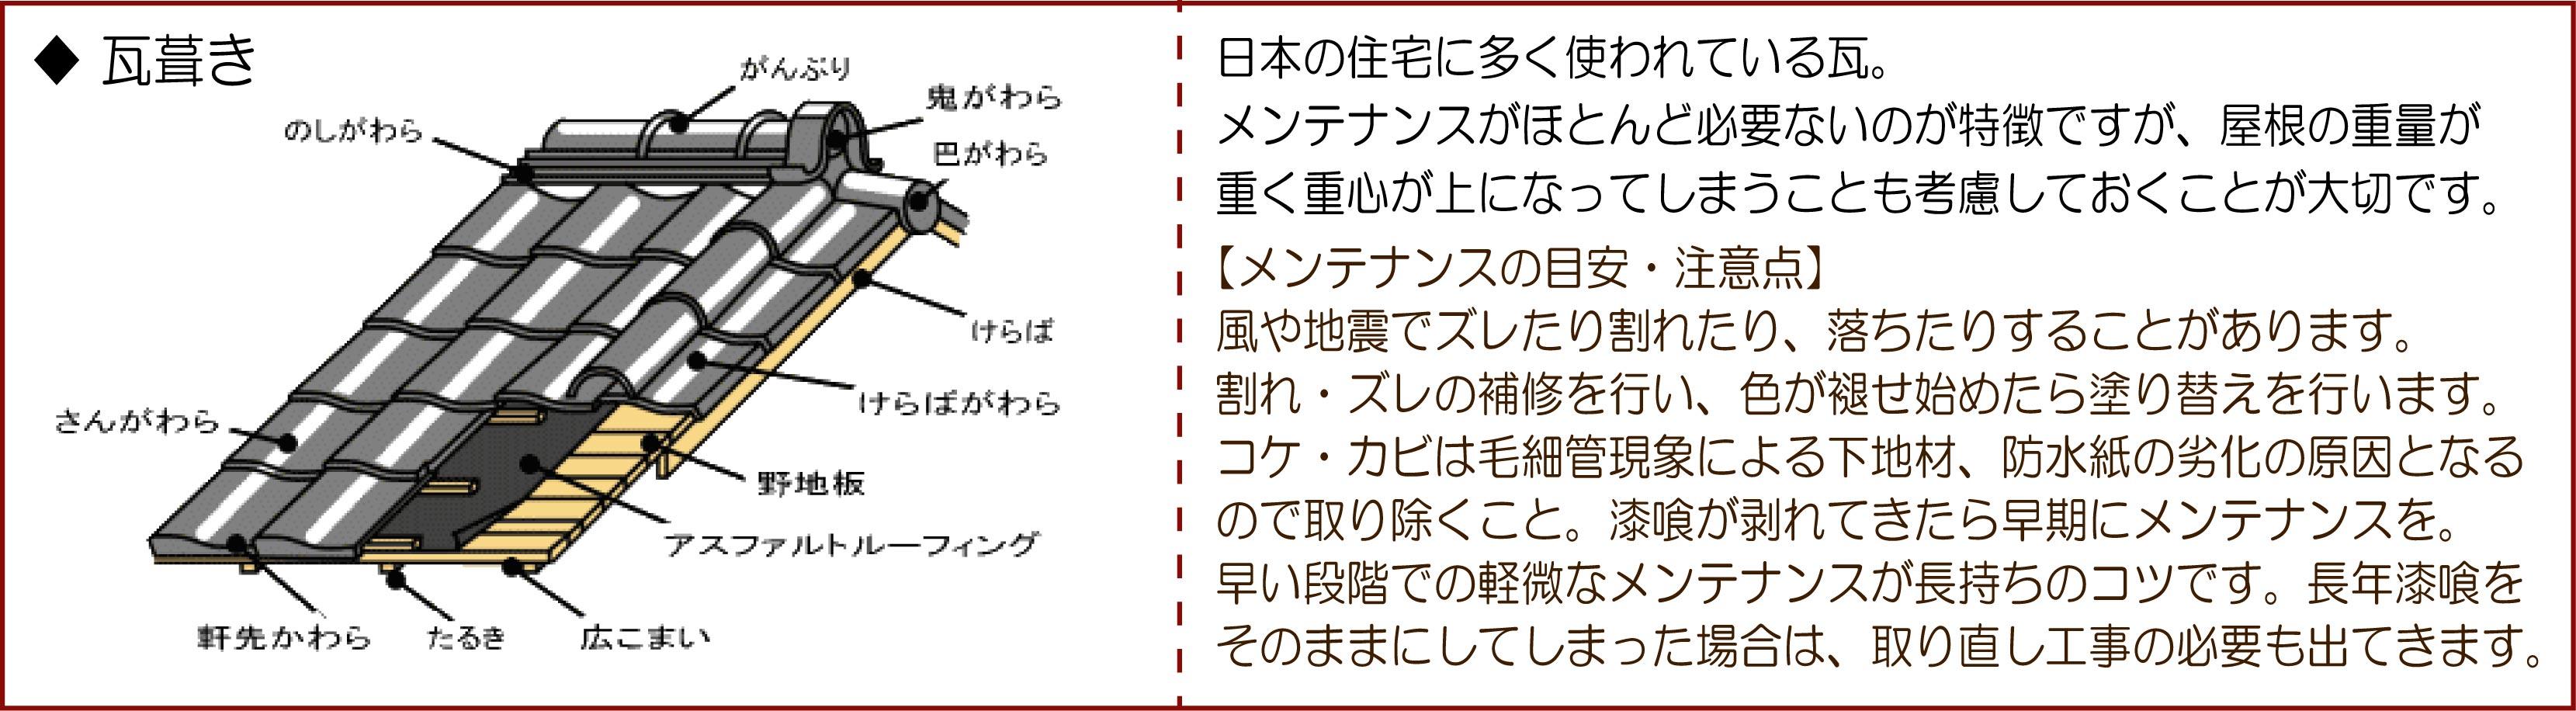 KuraSi-natu-sin80-09.jpg